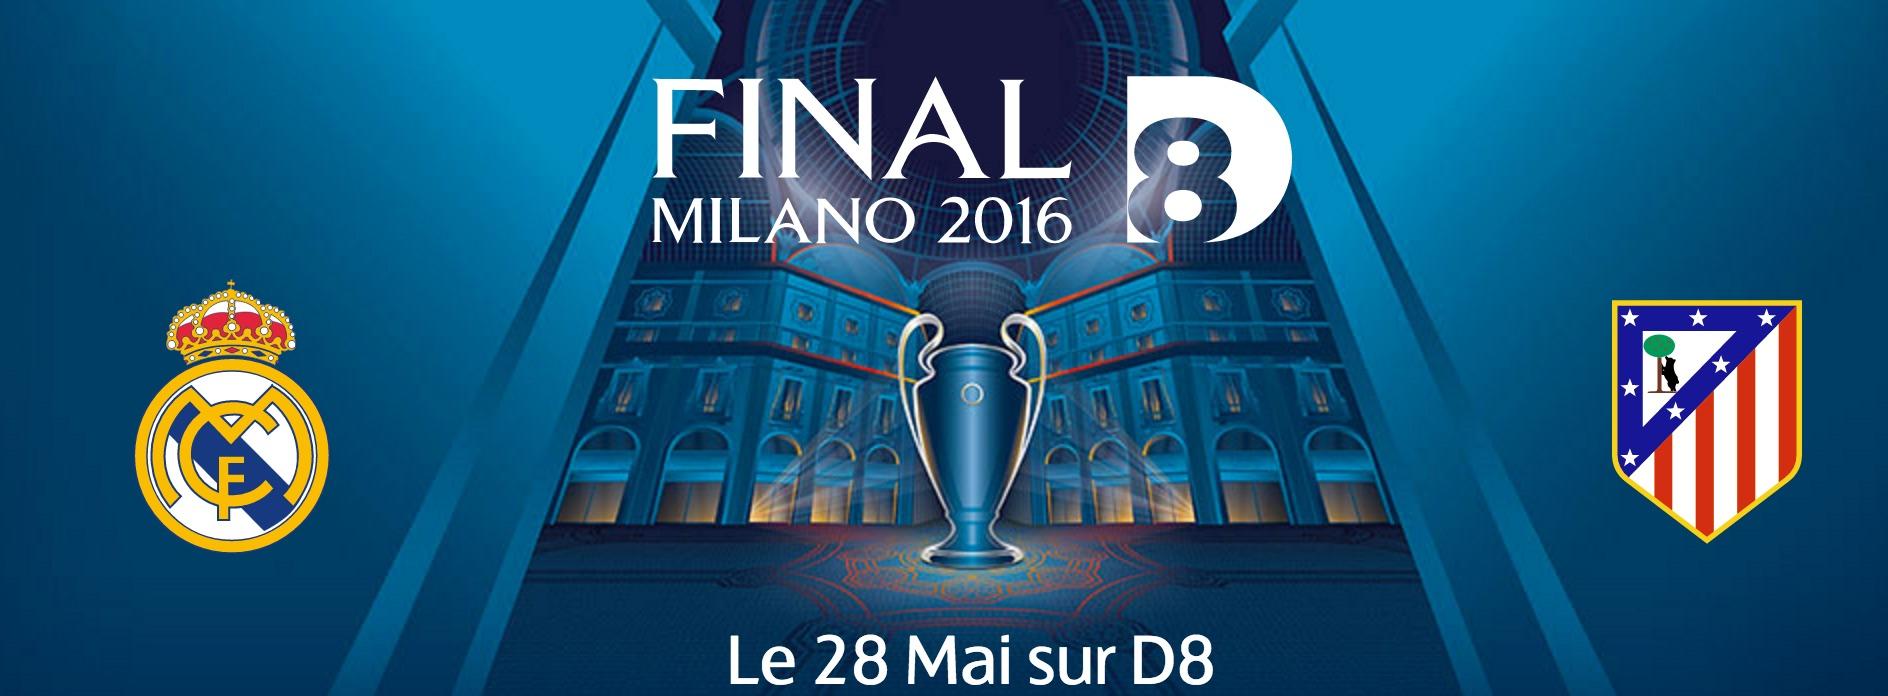 voir la finale LDC en live streaming 28 mai 2016